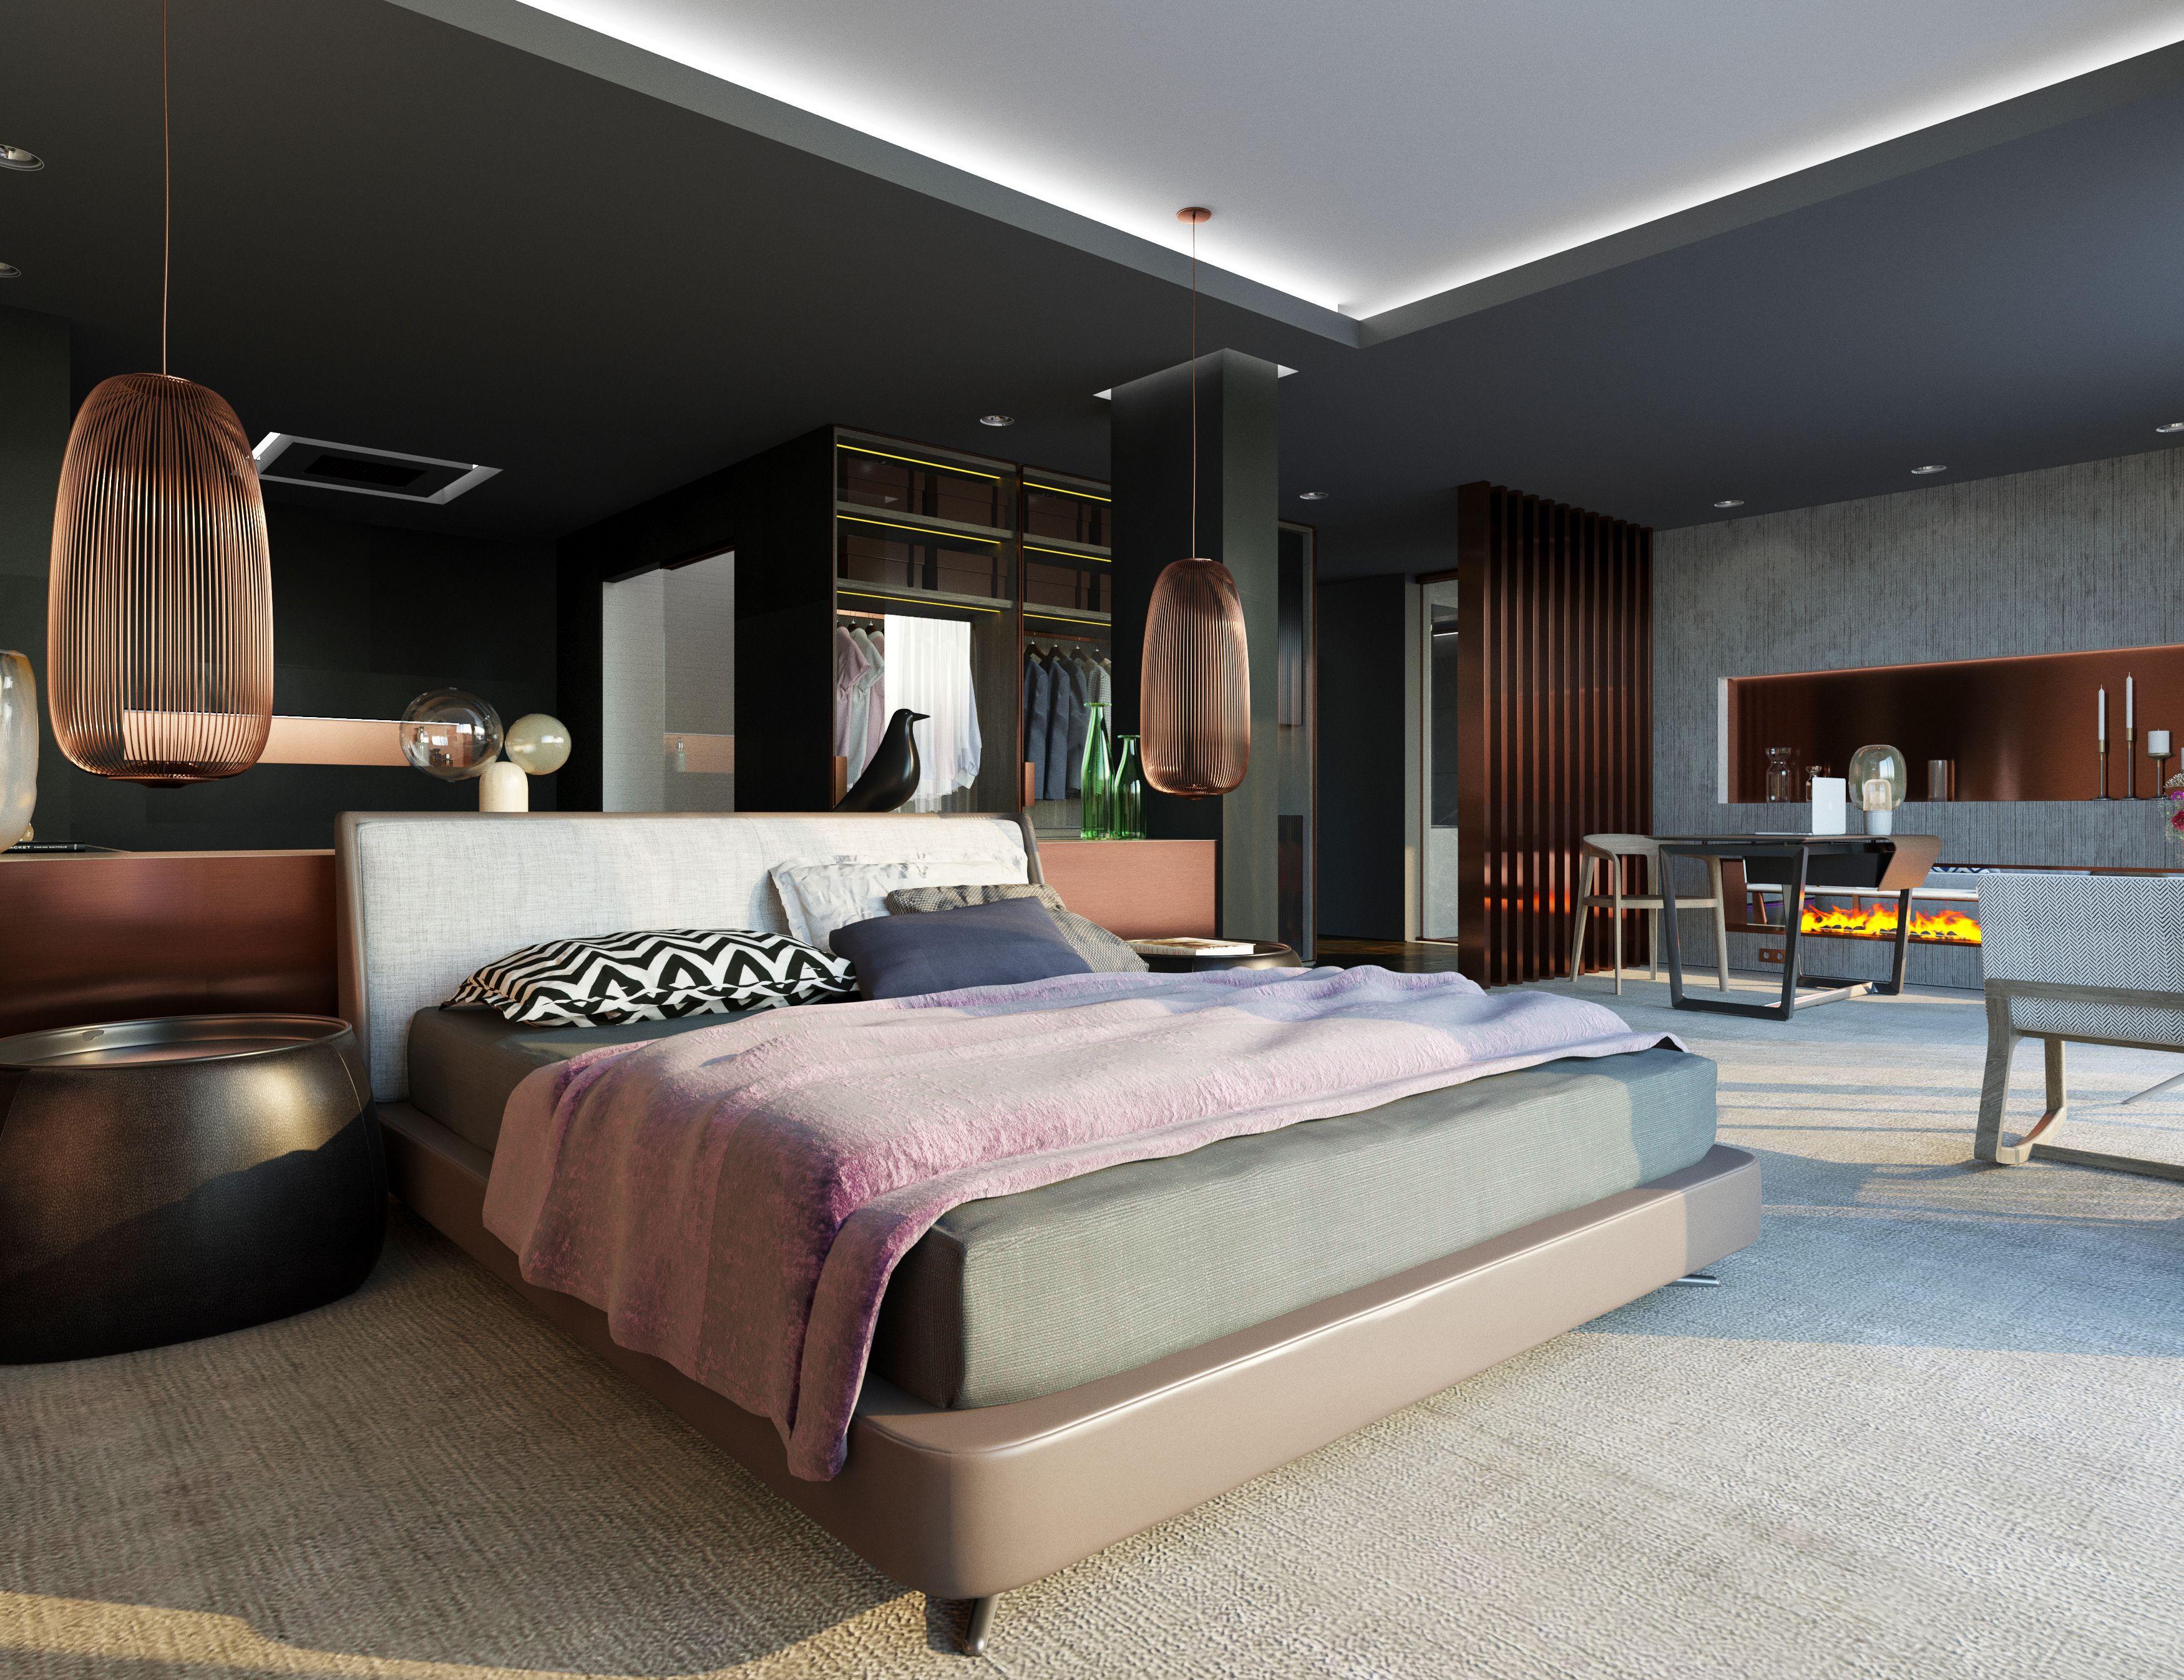 corona render benim apartmana m pinterest corona and room